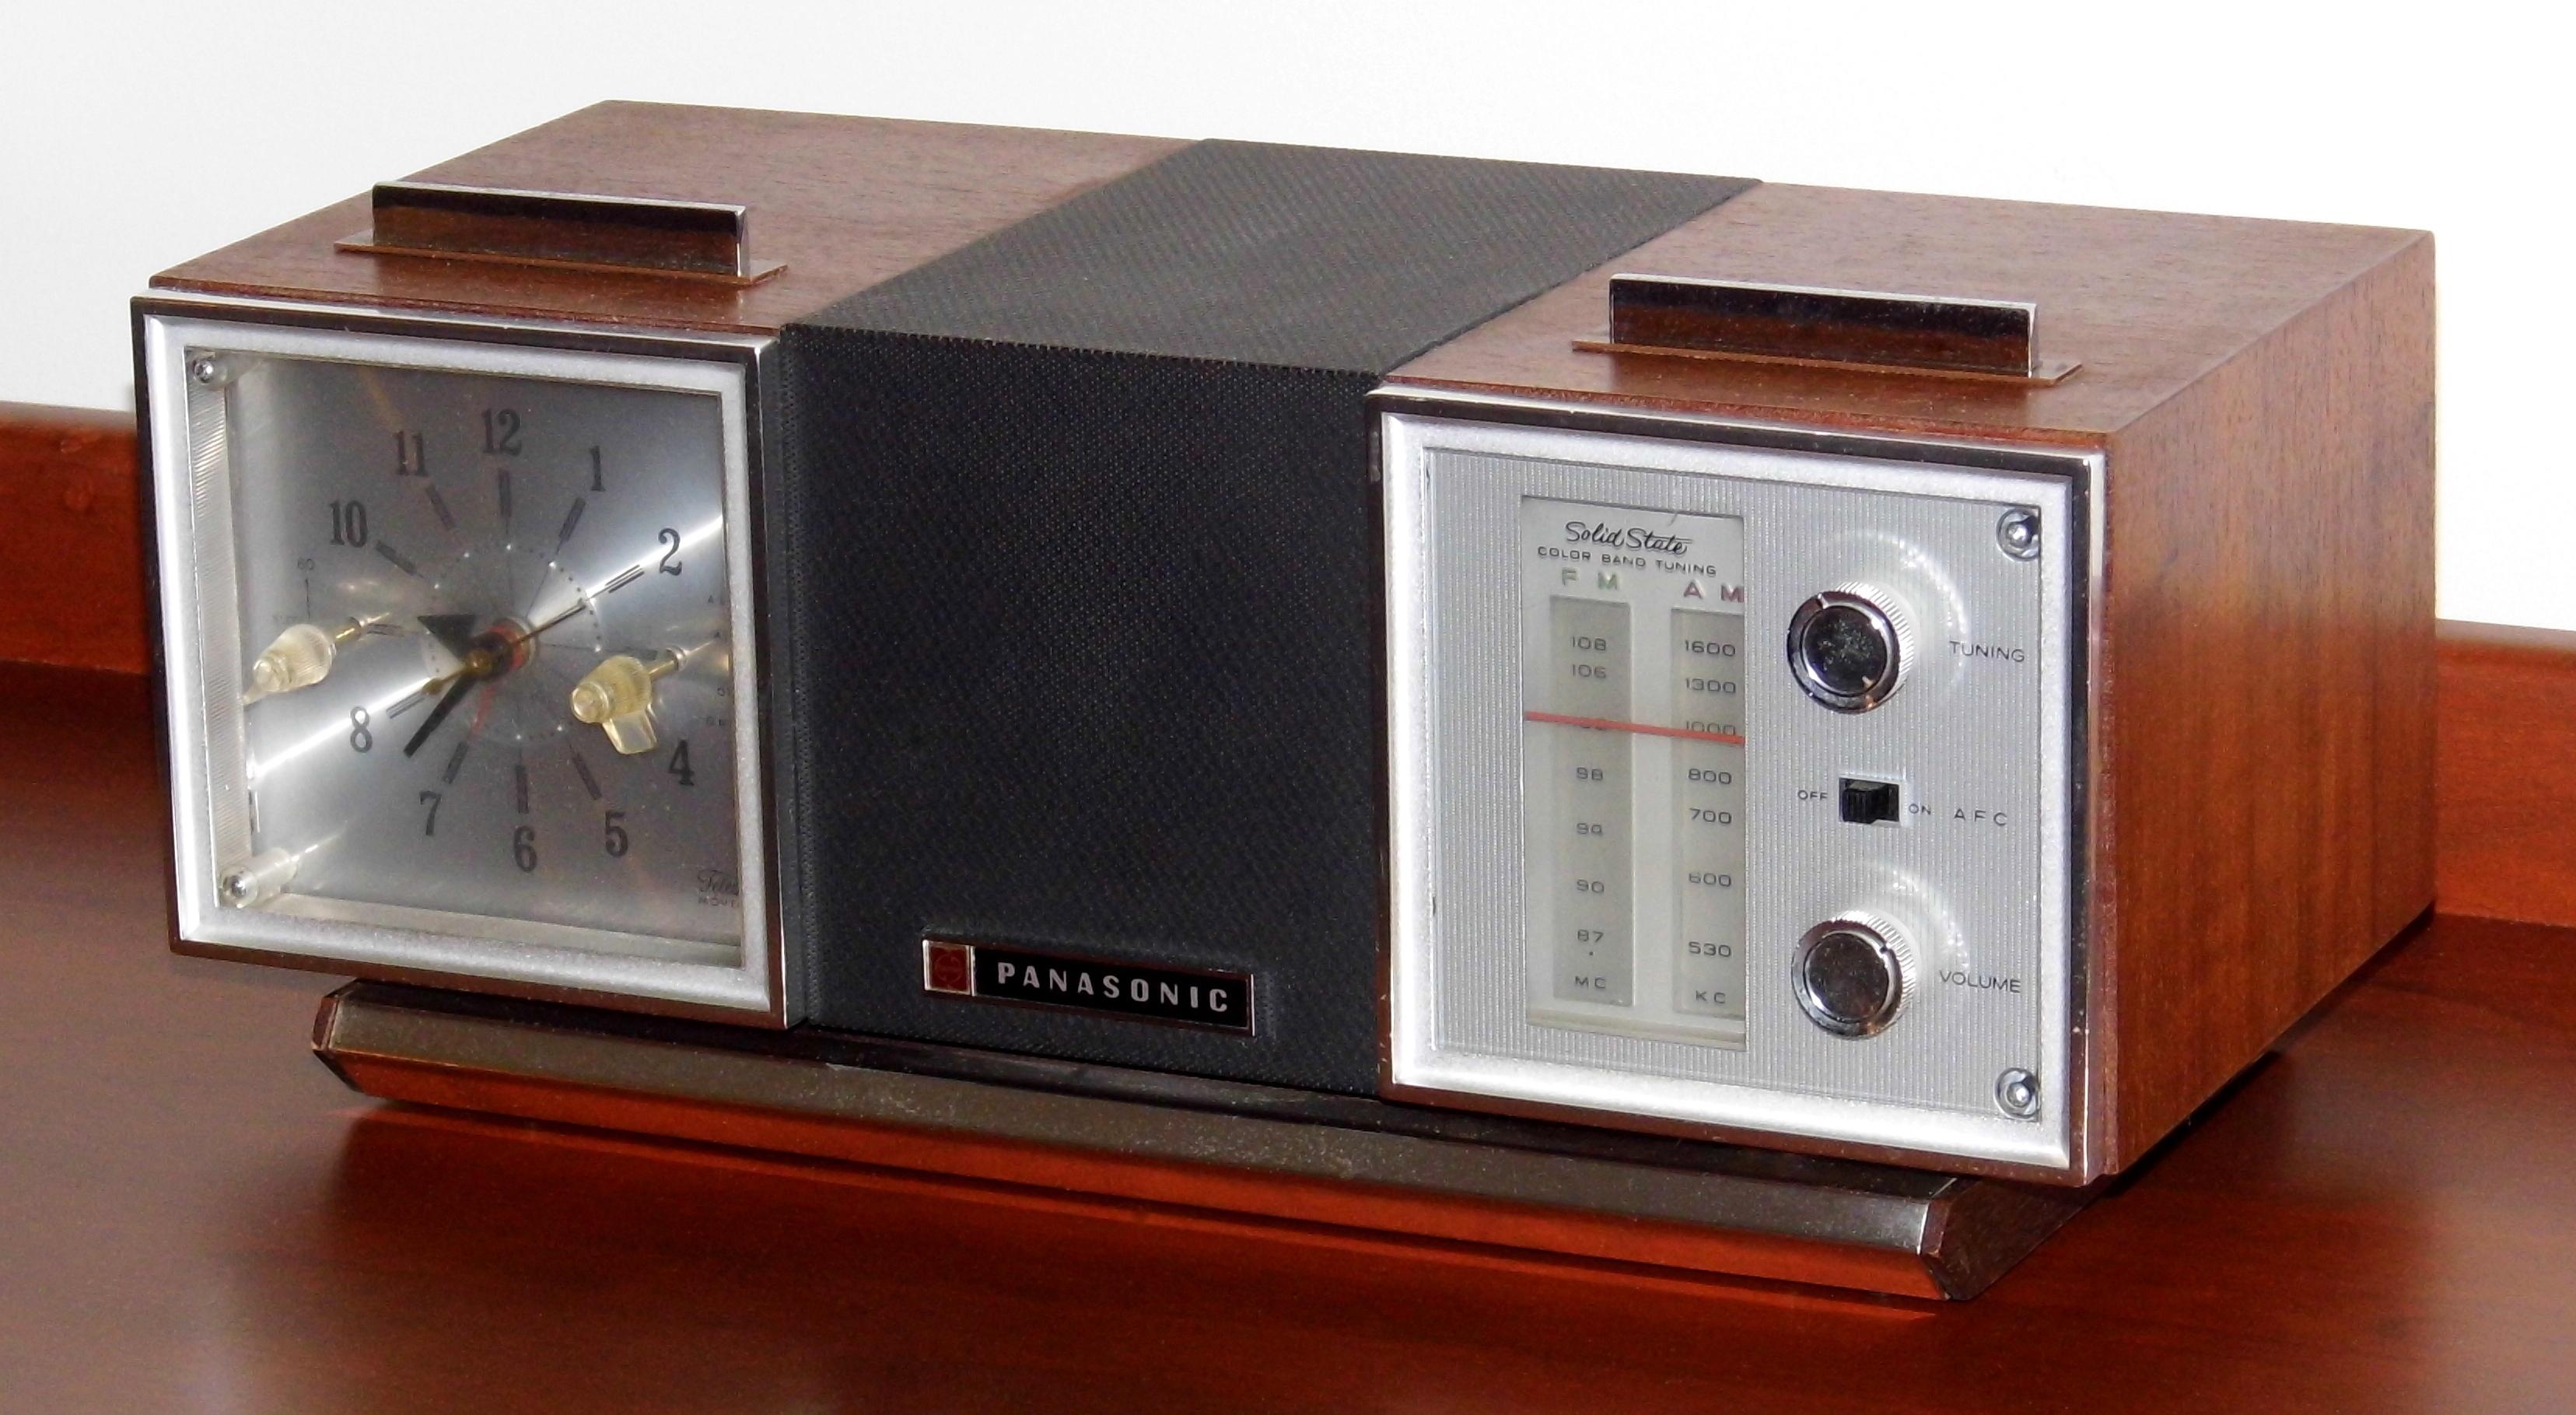 Valuable vintage panasonic electronics